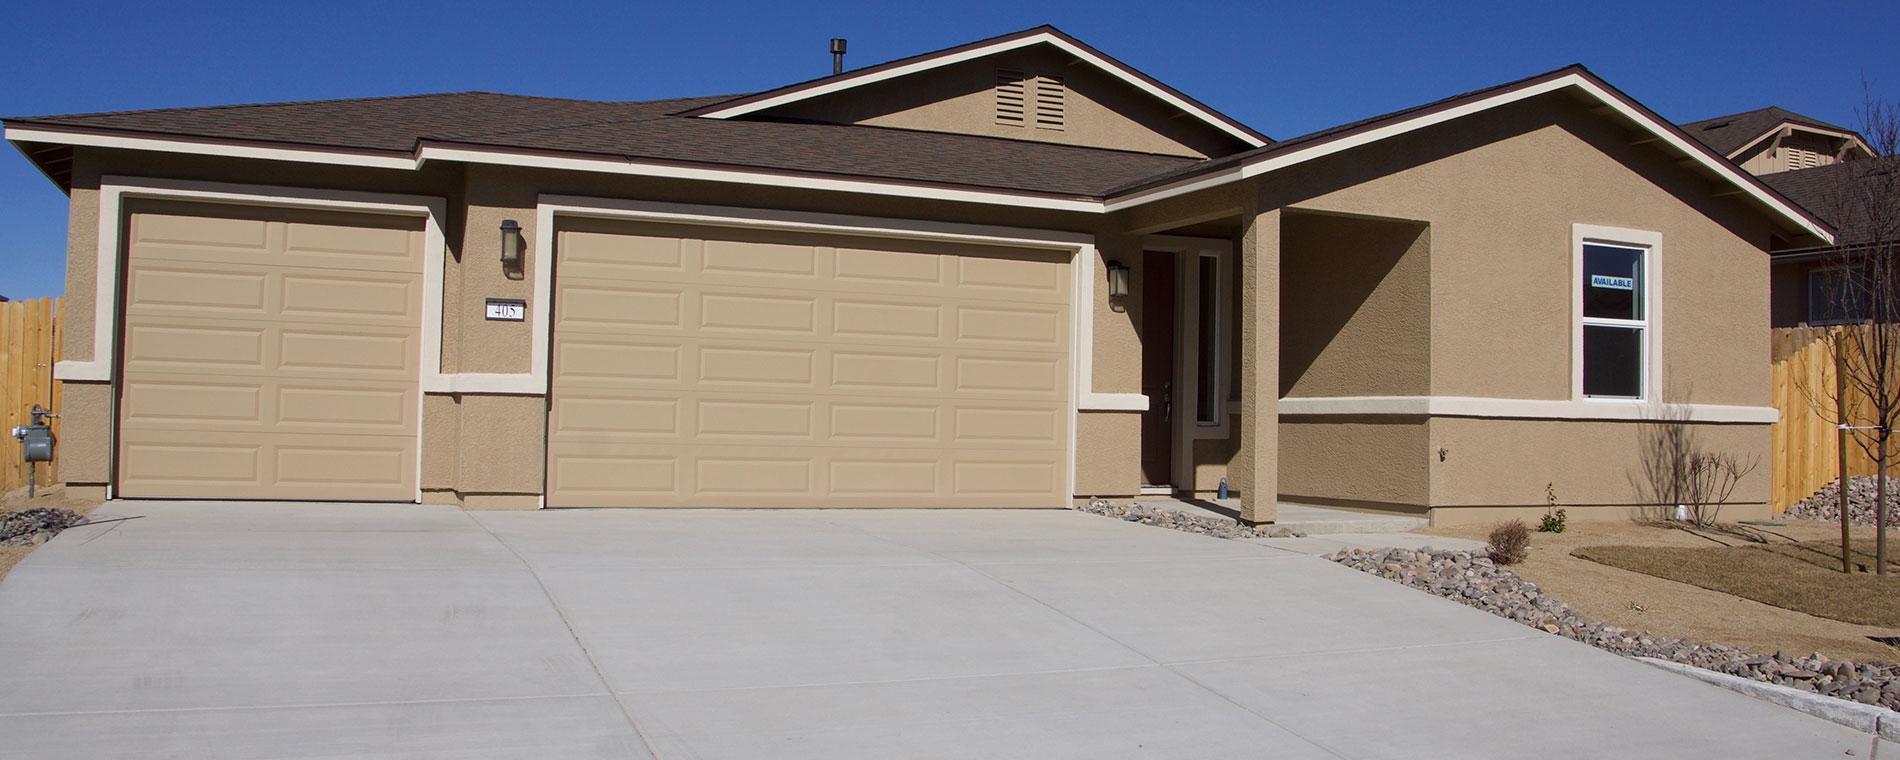 new-homes-golden-valley-northridge-lot-90-model-home-exterior-banner